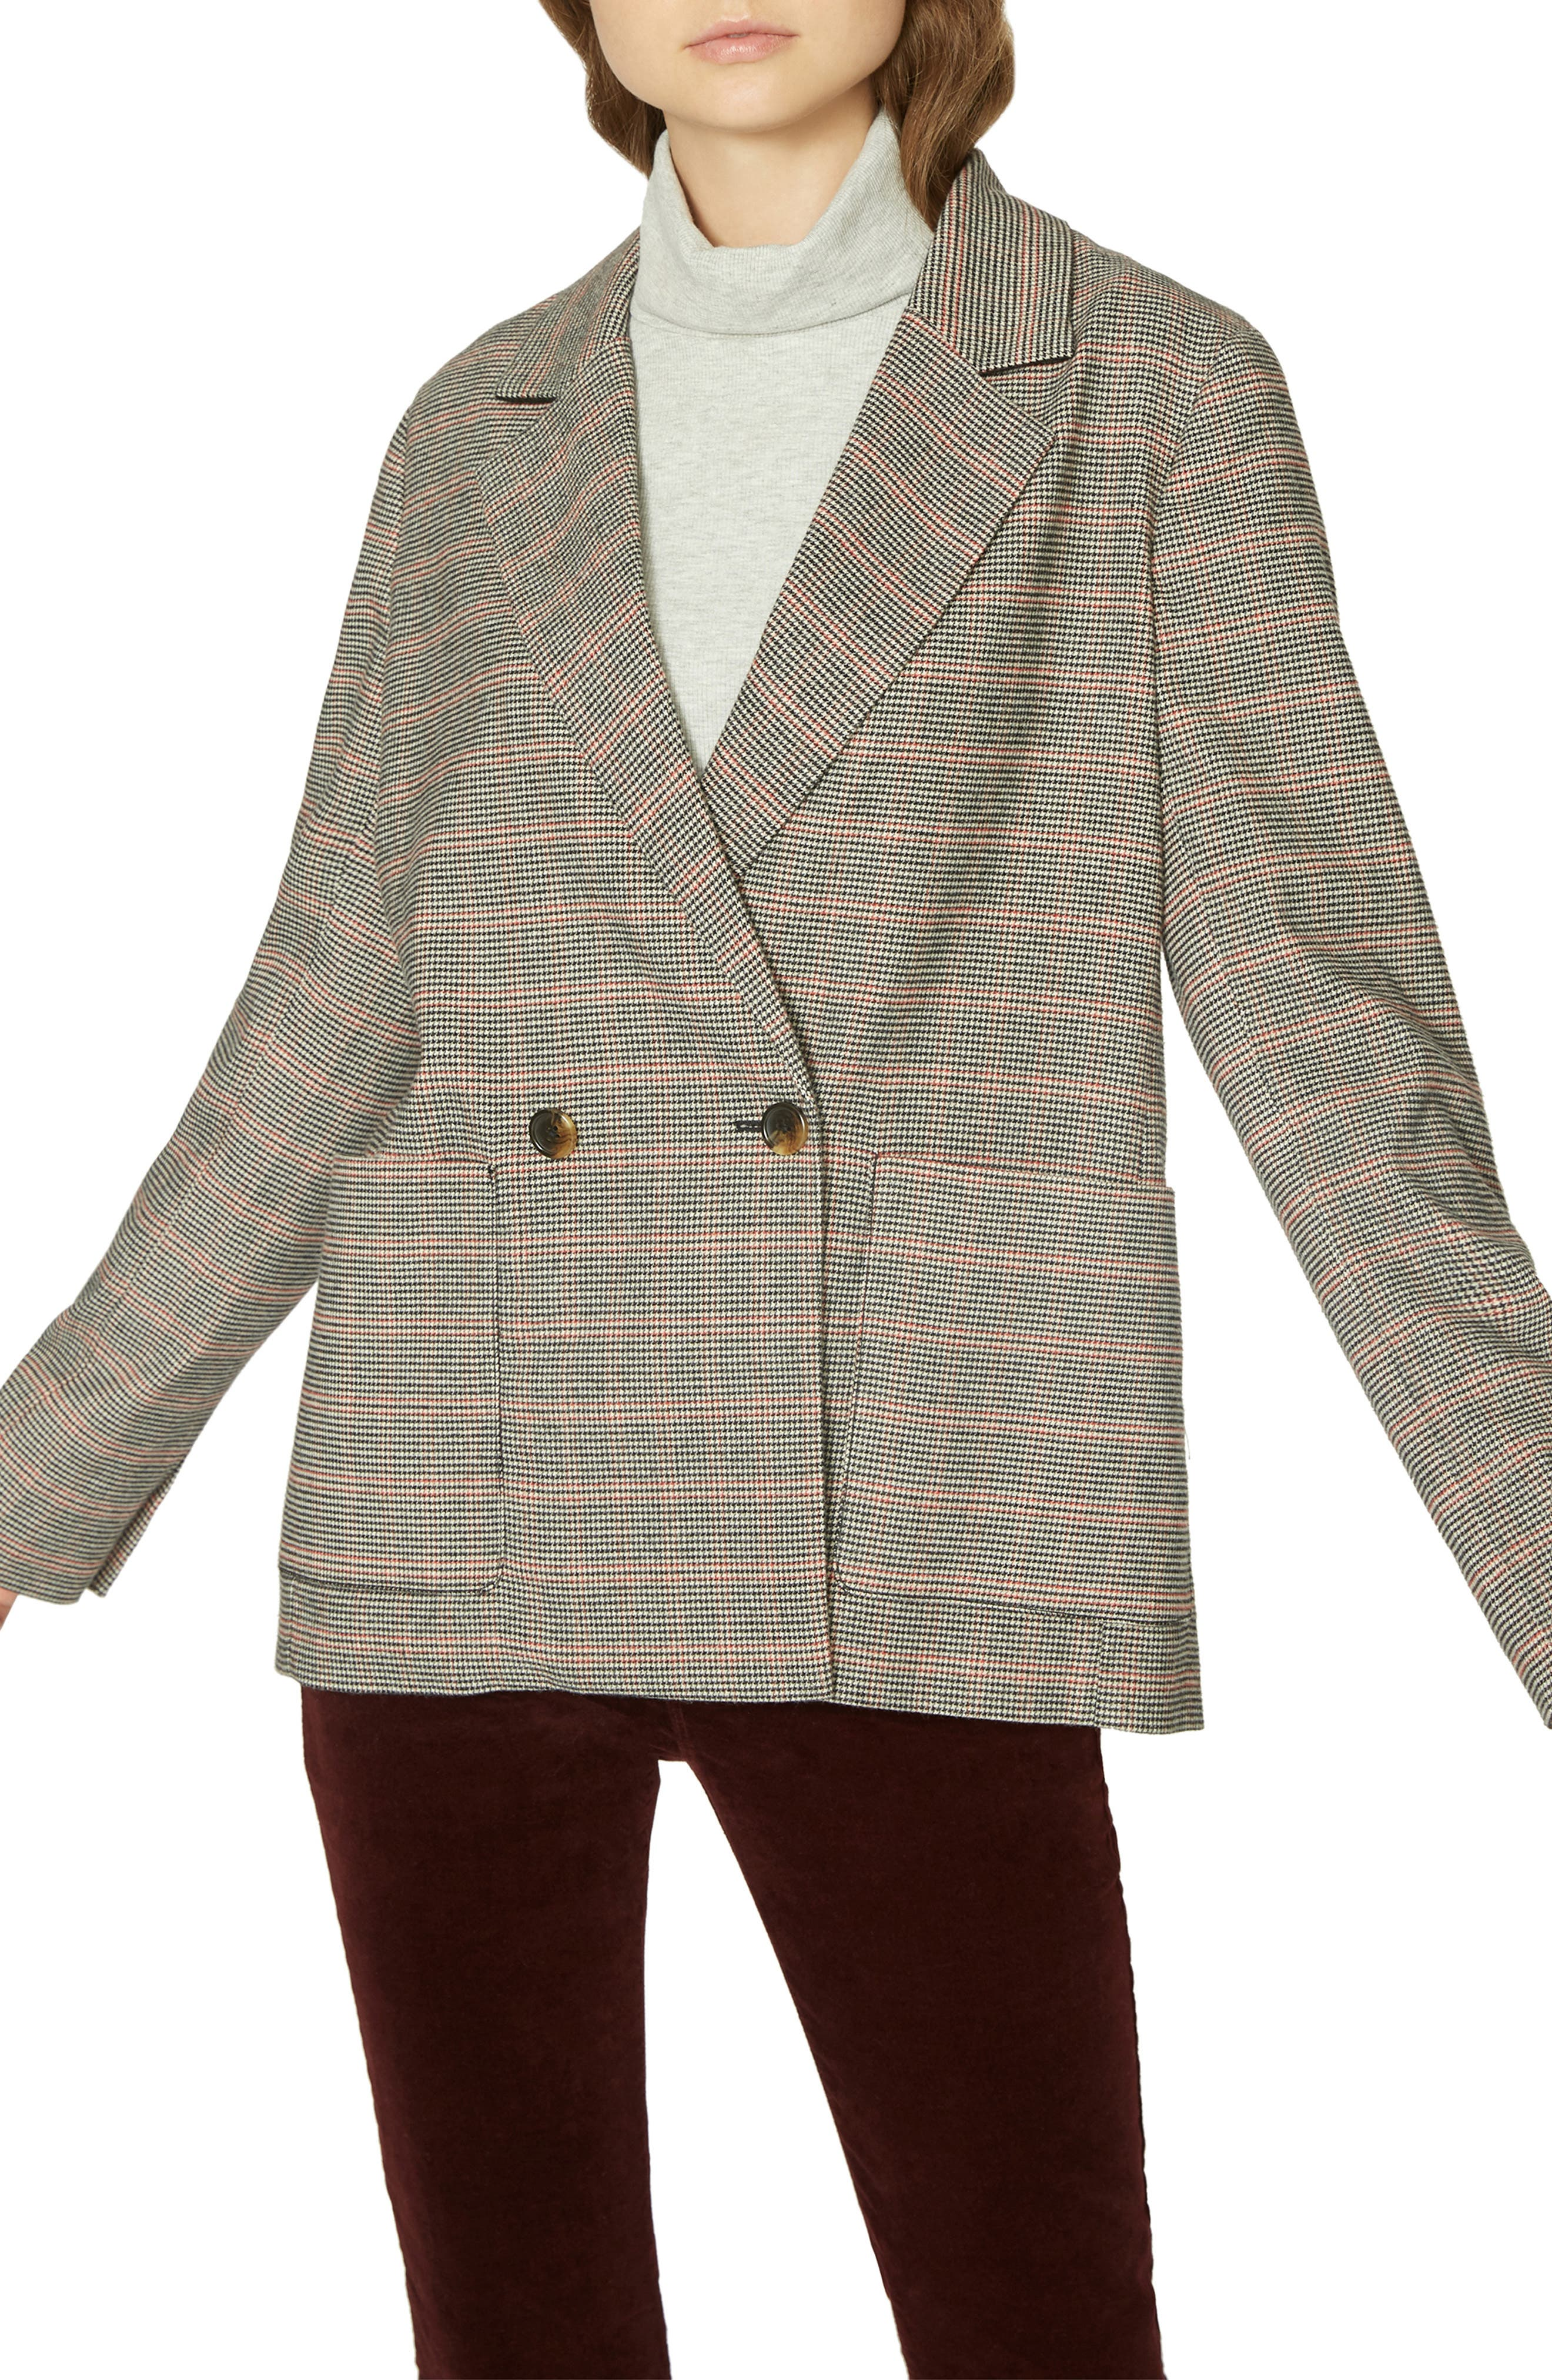 Vintage Coats & Jackets | Retro Coats and Jackets Womens Sanctuary Heritage Plaid Boyfriend Blazer Size XX-Large - Black $89.40 AT vintagedancer.com